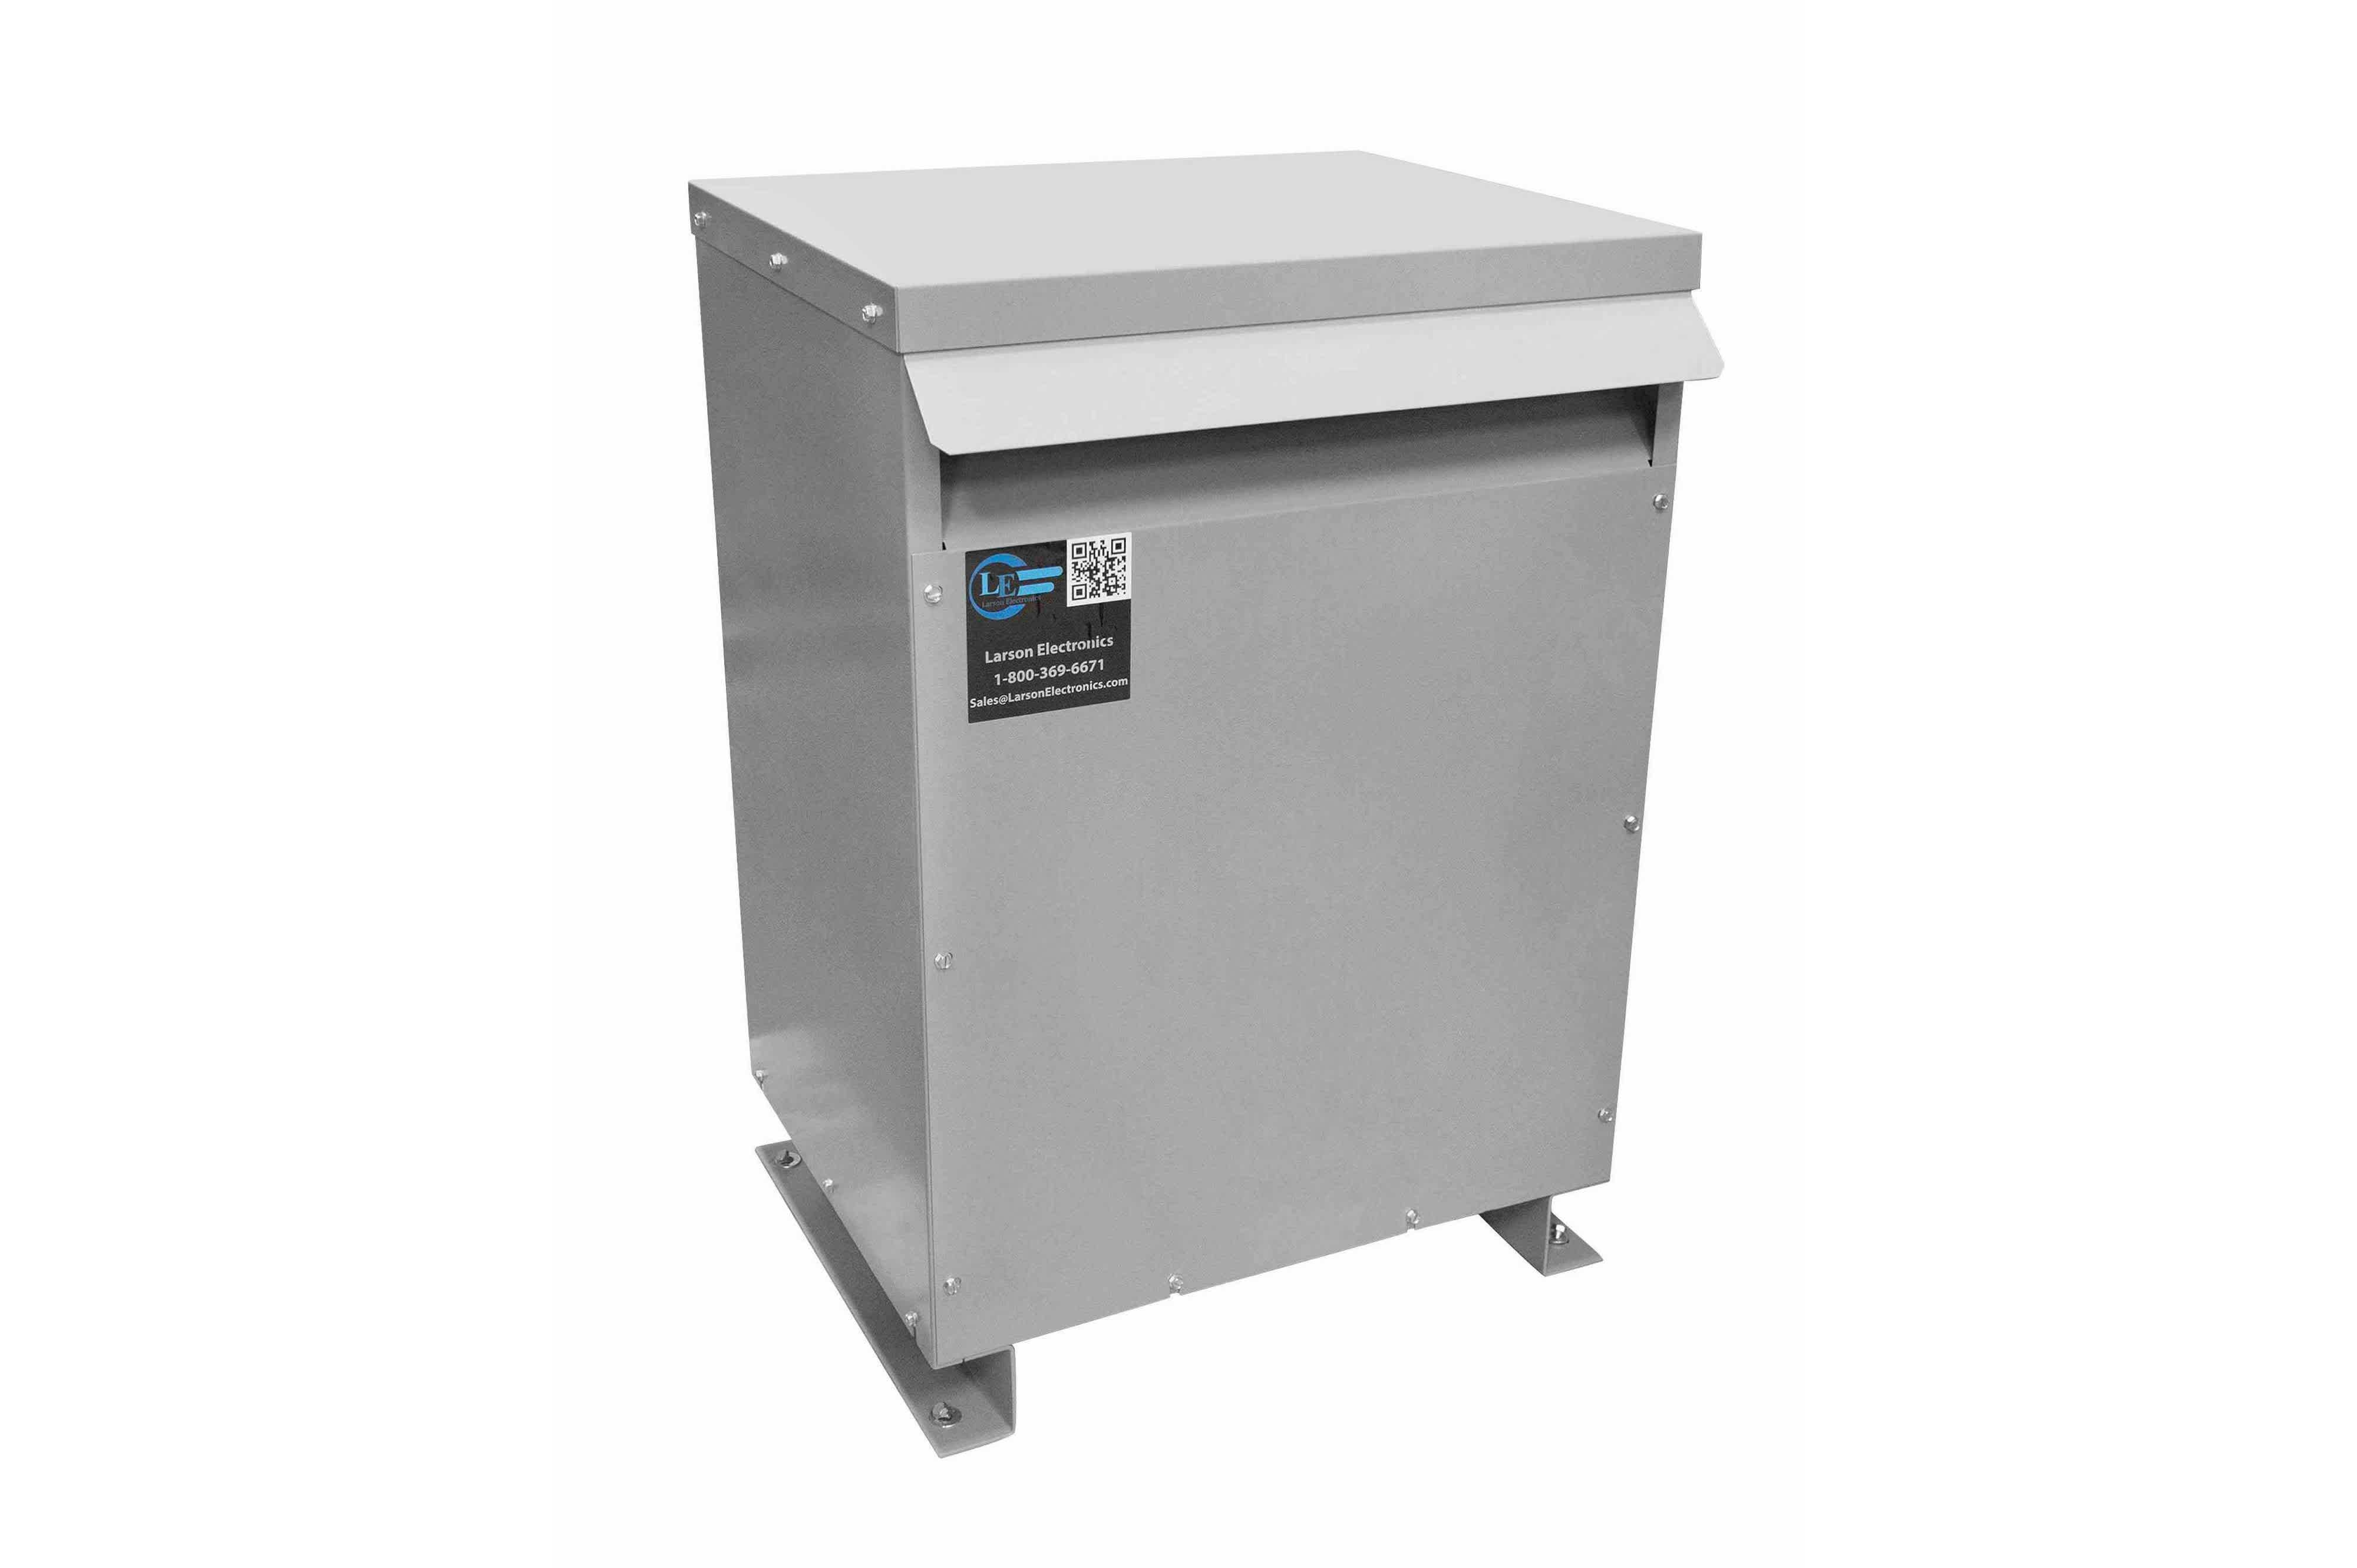 38 kVA 3PH DOE Transformer, 230V Delta Primary, 208Y/120 Wye-N Secondary, N3R, Ventilated, 60 Hz